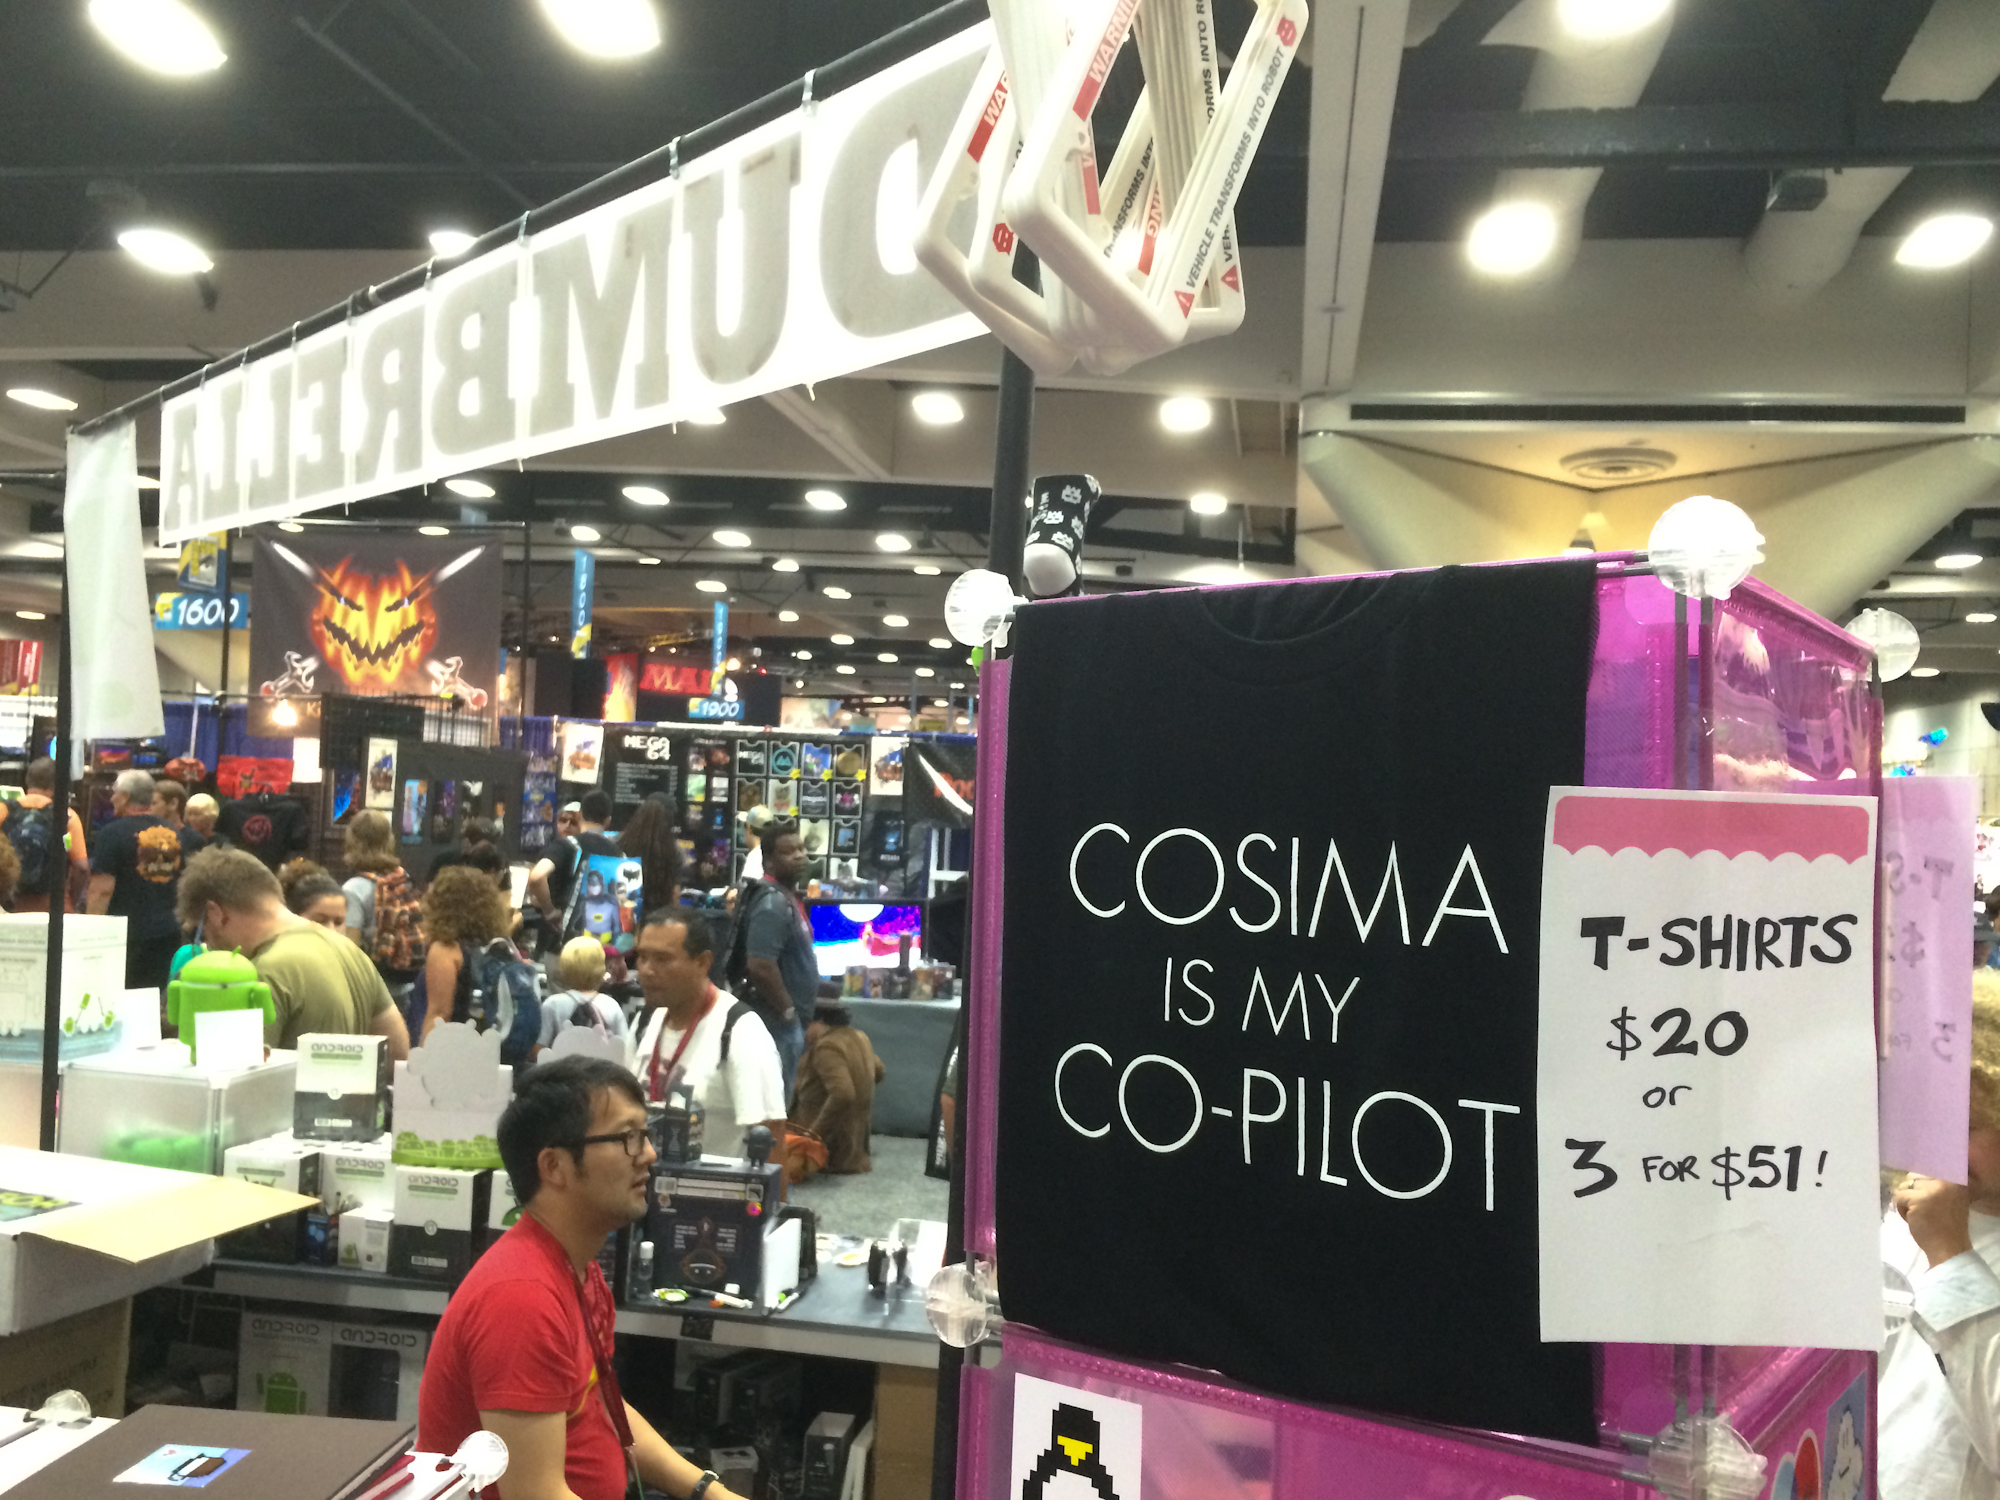 cosima-is-my-co-pilot-orphan-black-cloneclub-san-diego-comic-con.jpg